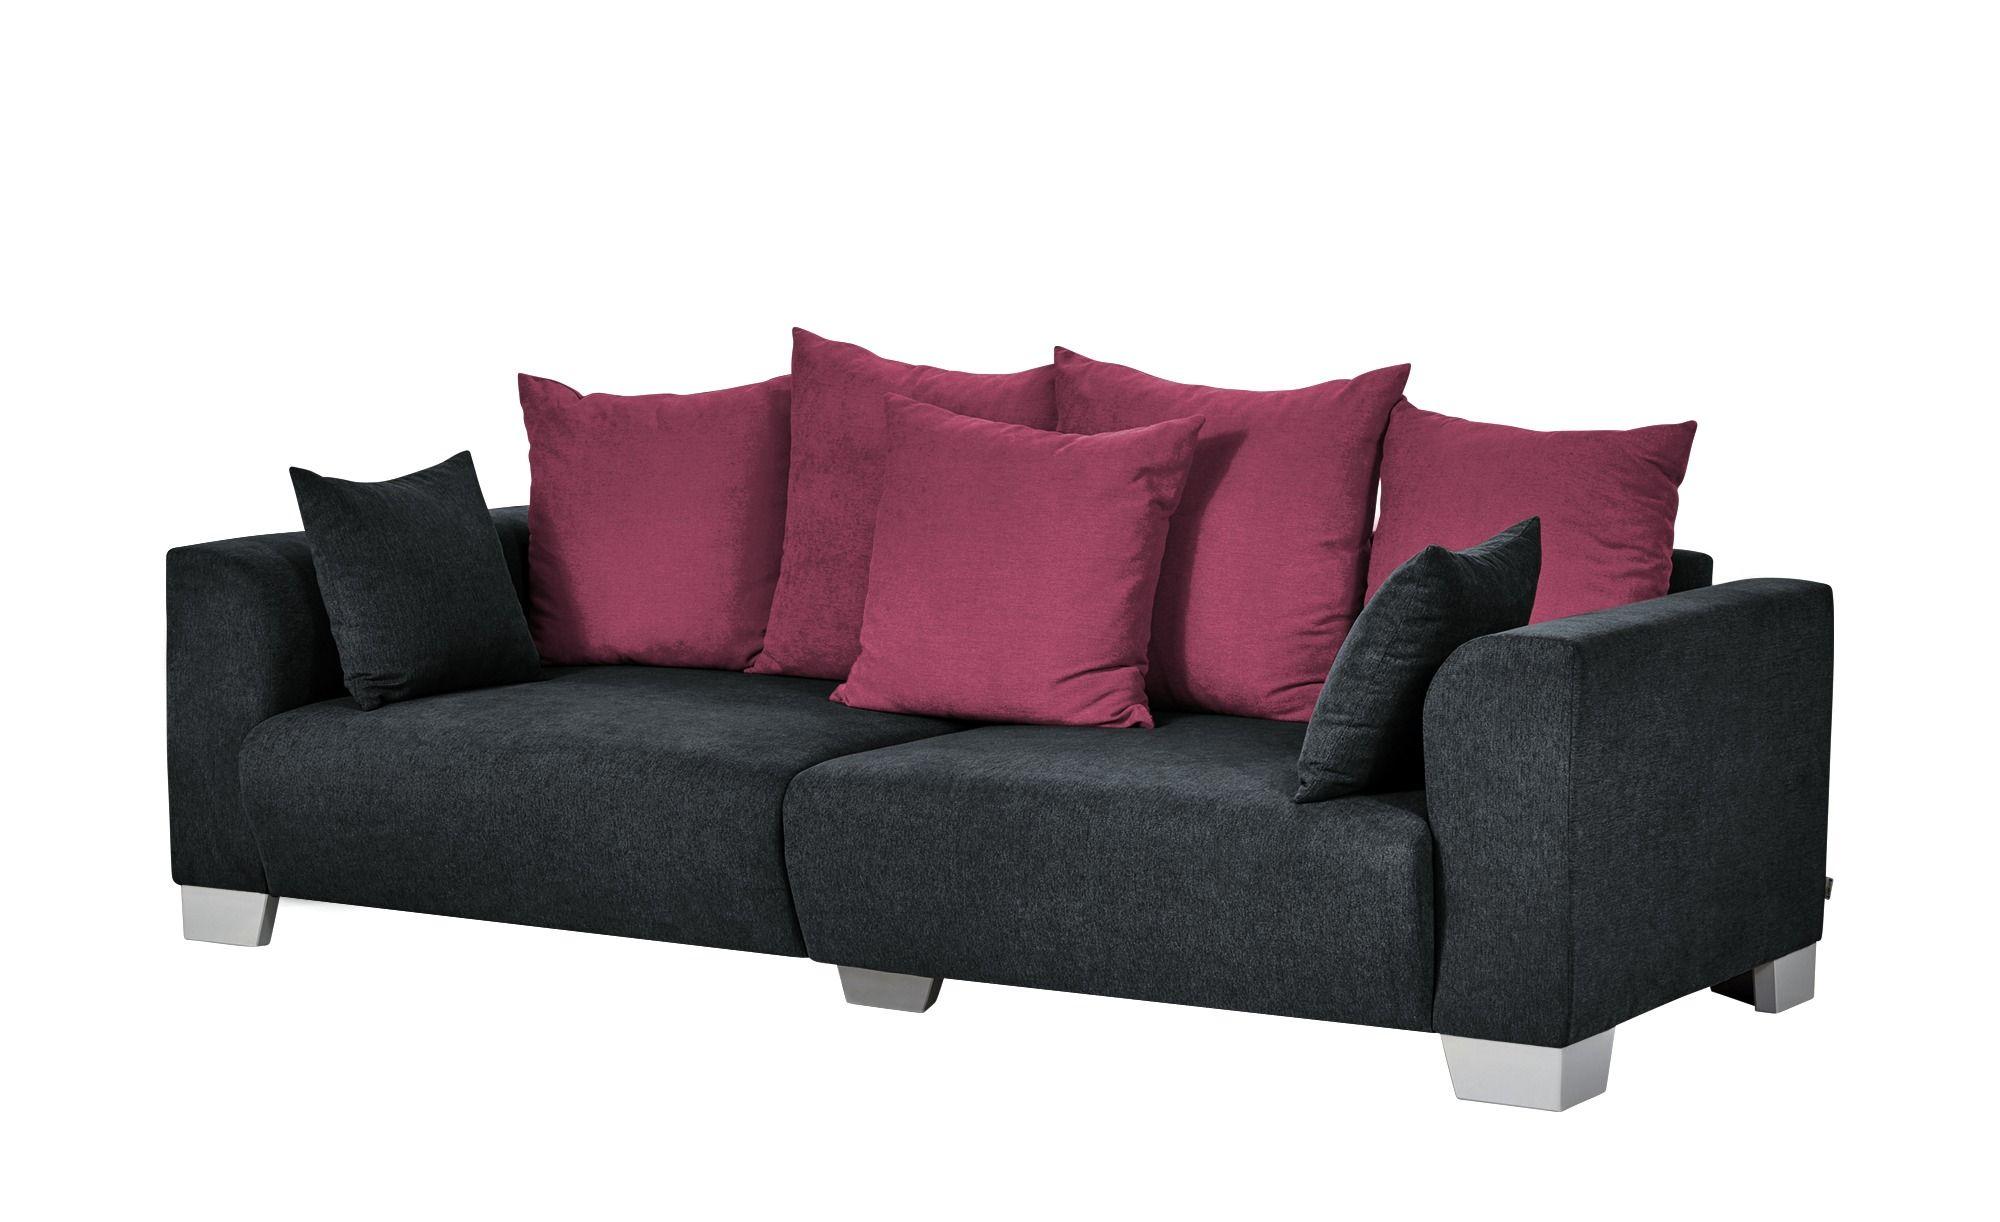 Smart Big Sofa Schwarz Flachgewebe Tonja In 2019 Grosse Sofas Sofa Und Big Sofa Grau